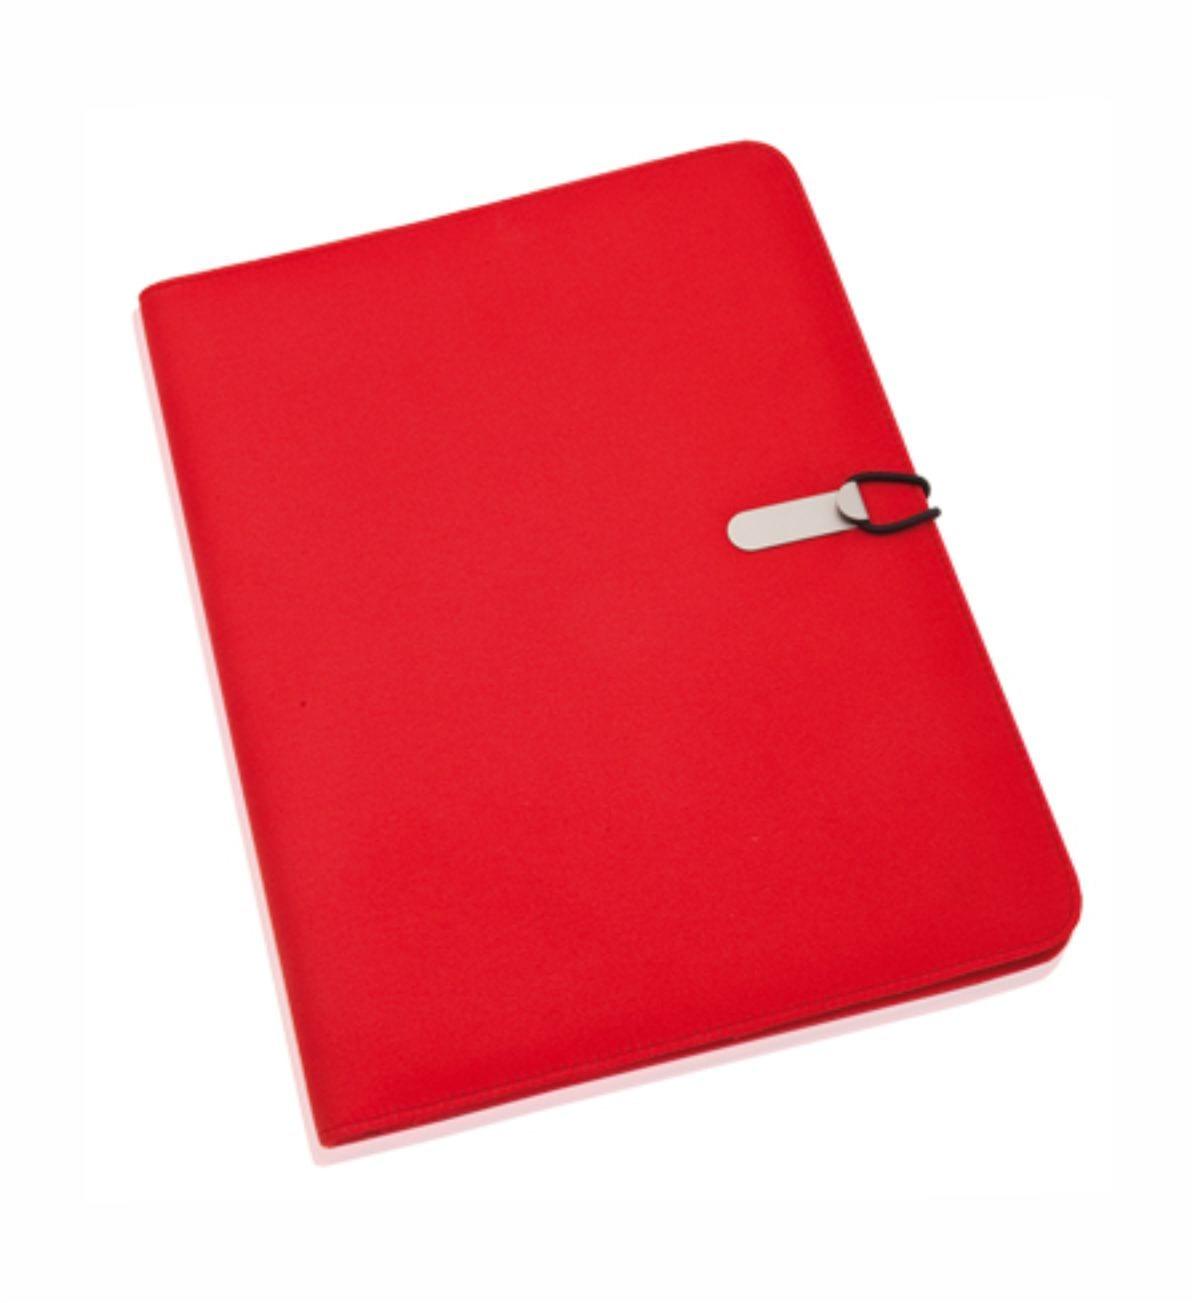 Carpeta Congresos Roja. Merchandising Empresarial